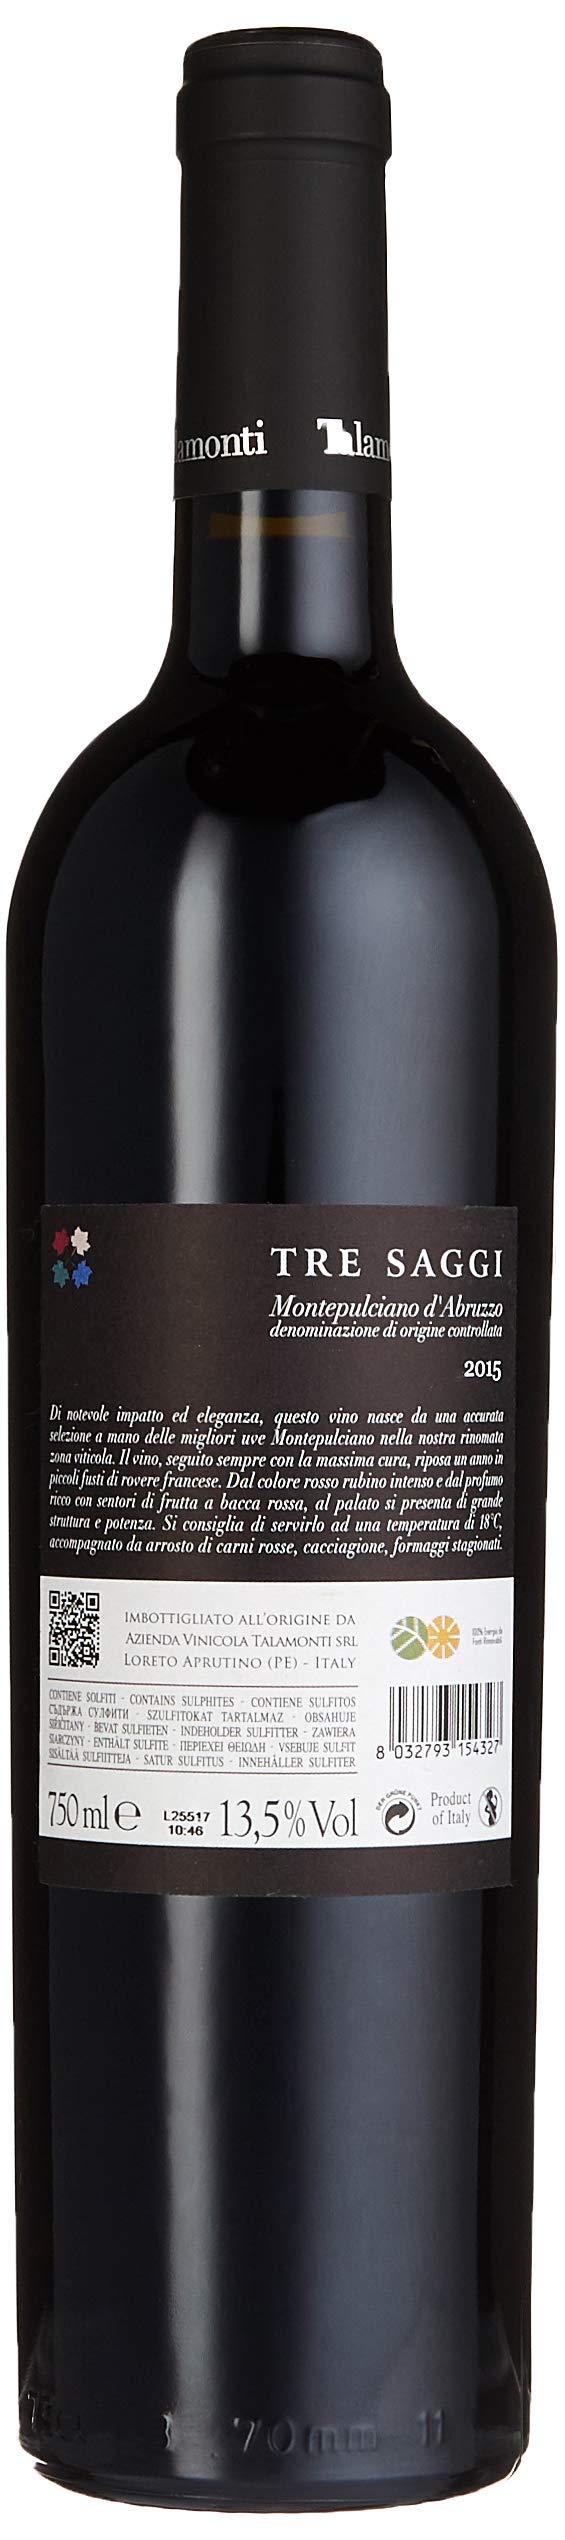 Talamonti-Tre-Saggi-Montepulciano-dAbruzzo-DOC-20132015-3er-Pack-3-x-075-l